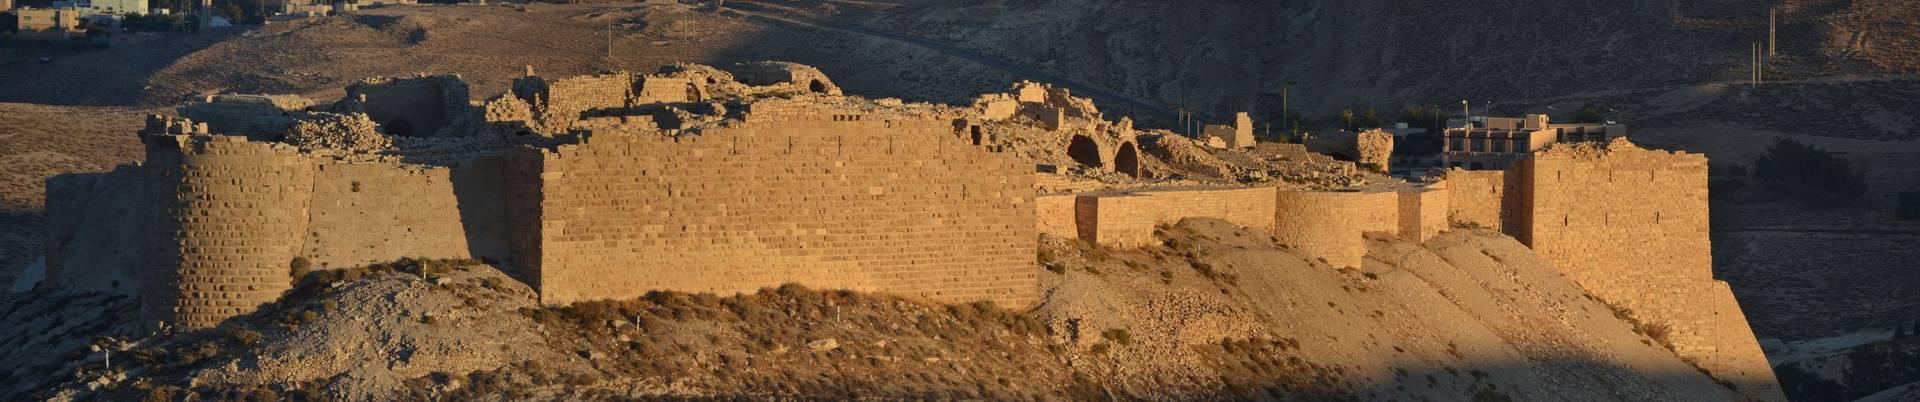 Jordanian, Castle